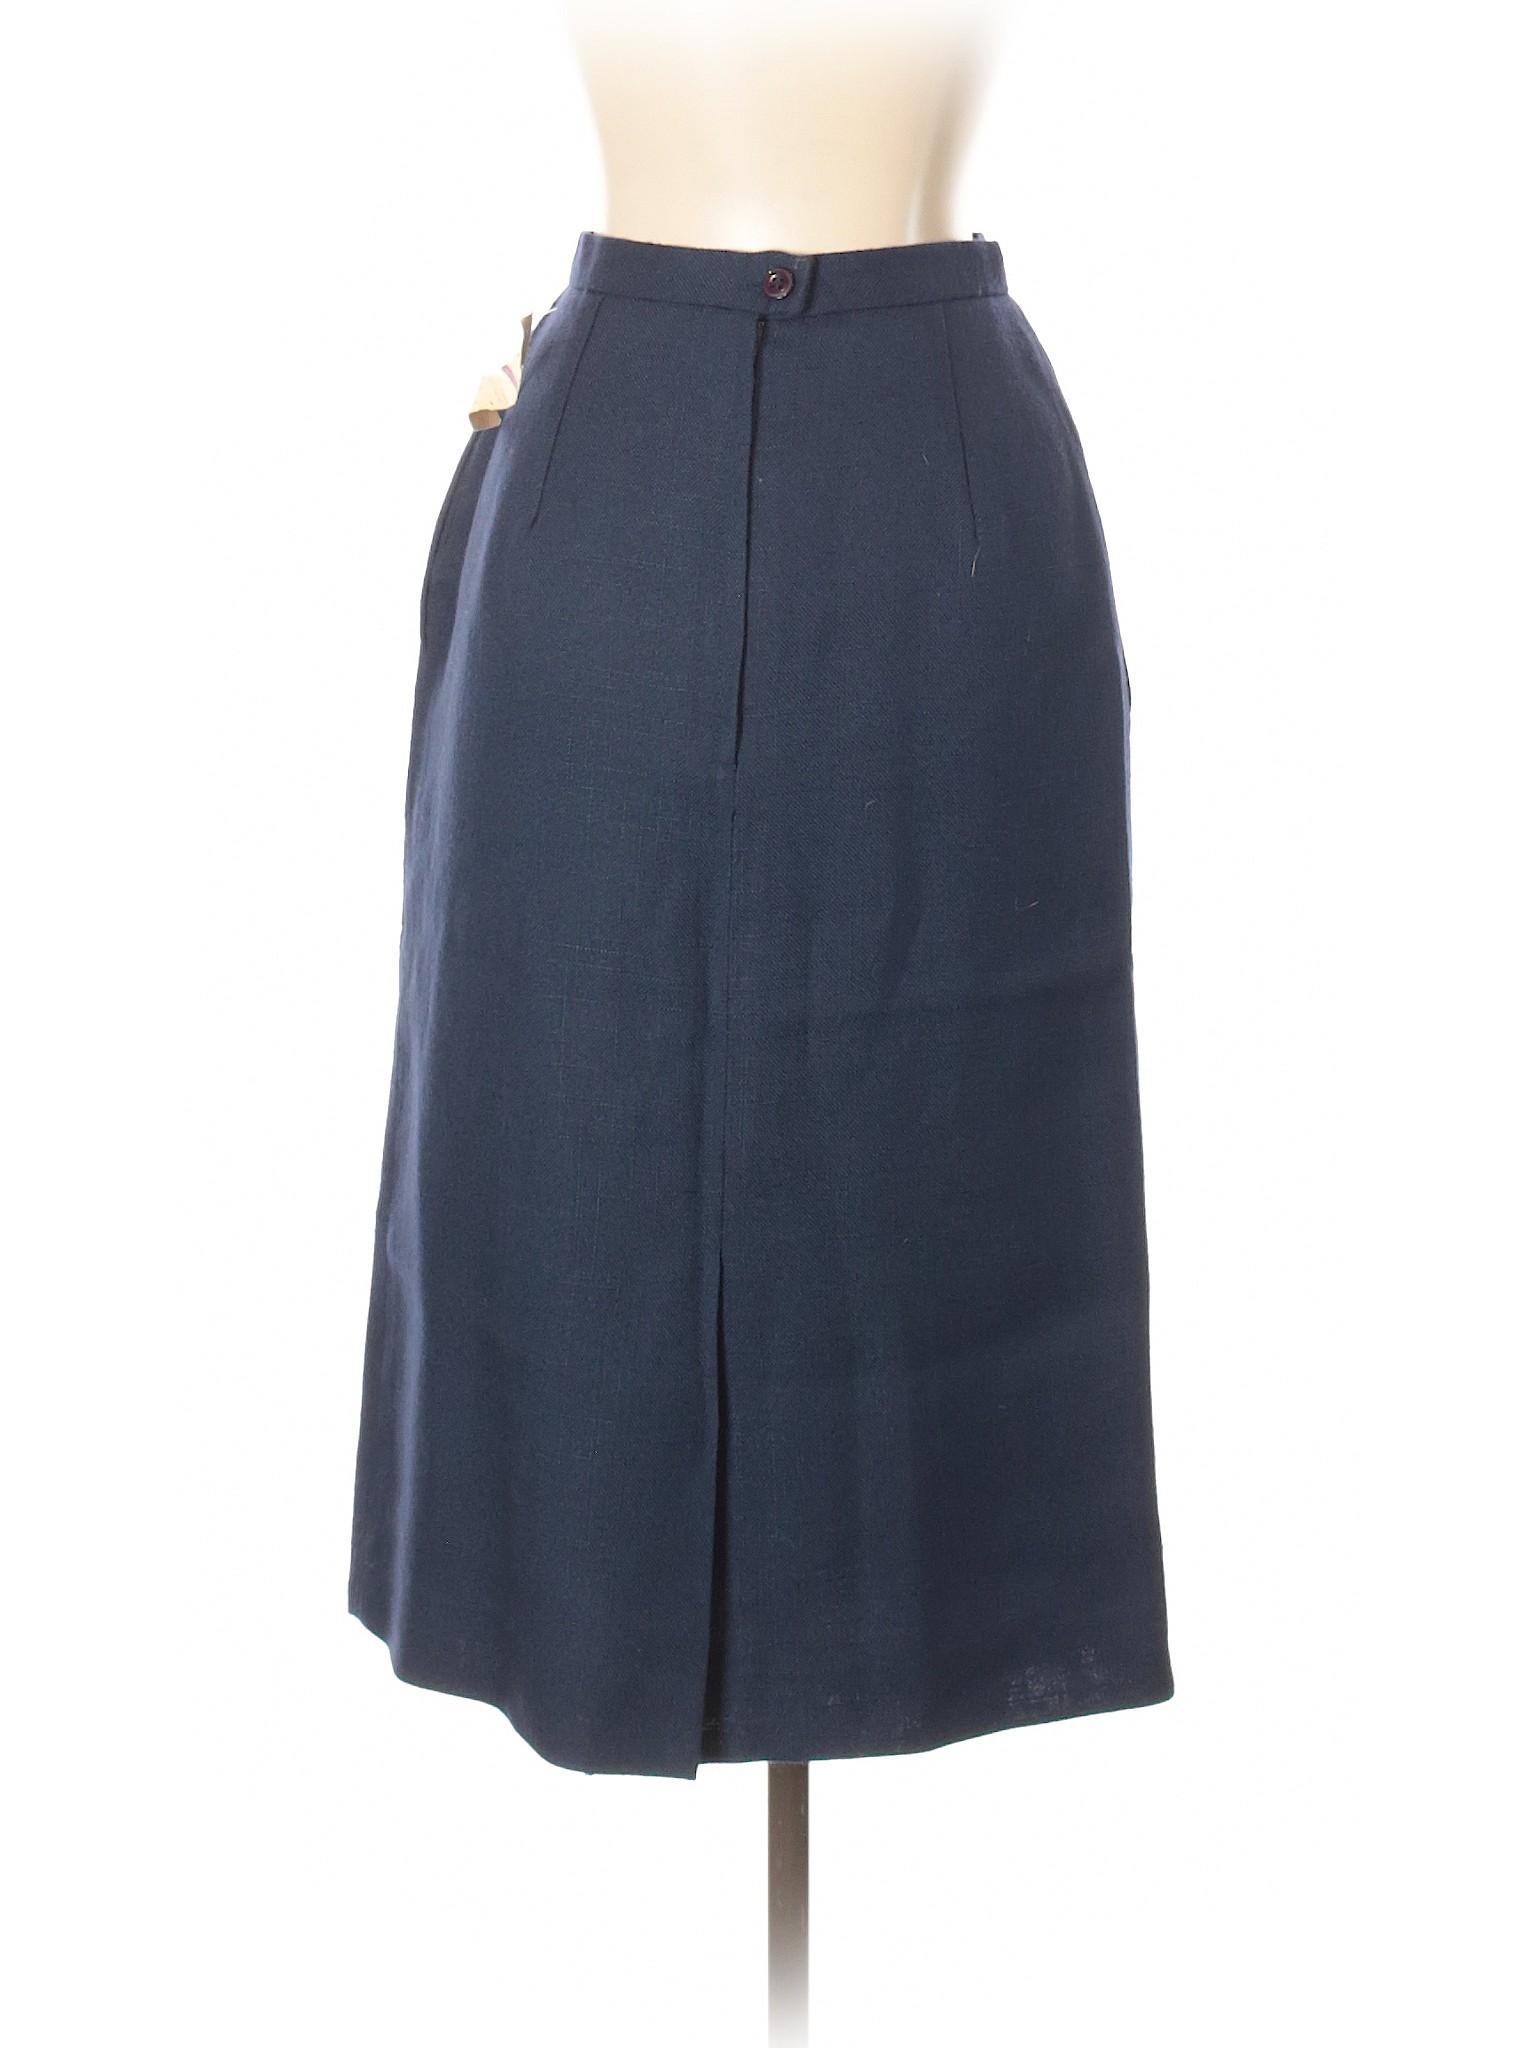 leisure Casual Skirt Sport Boutique New dqRtwnX